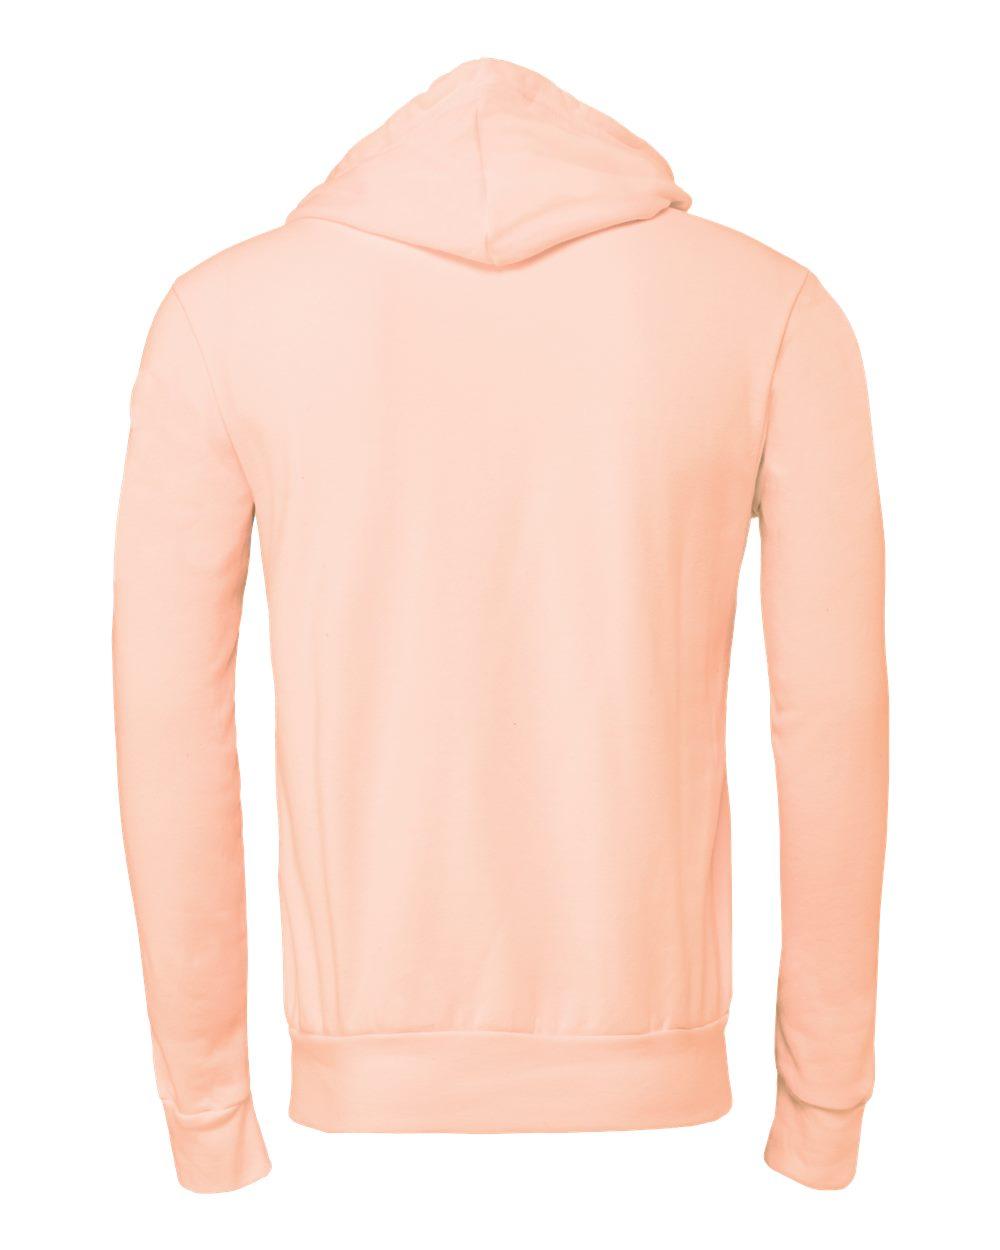 Bella-Canvas-Unisex-Sponge-Hooded-Pullover-Sweatshirt-Blank-3719-up-to-2XL thumbnail 83